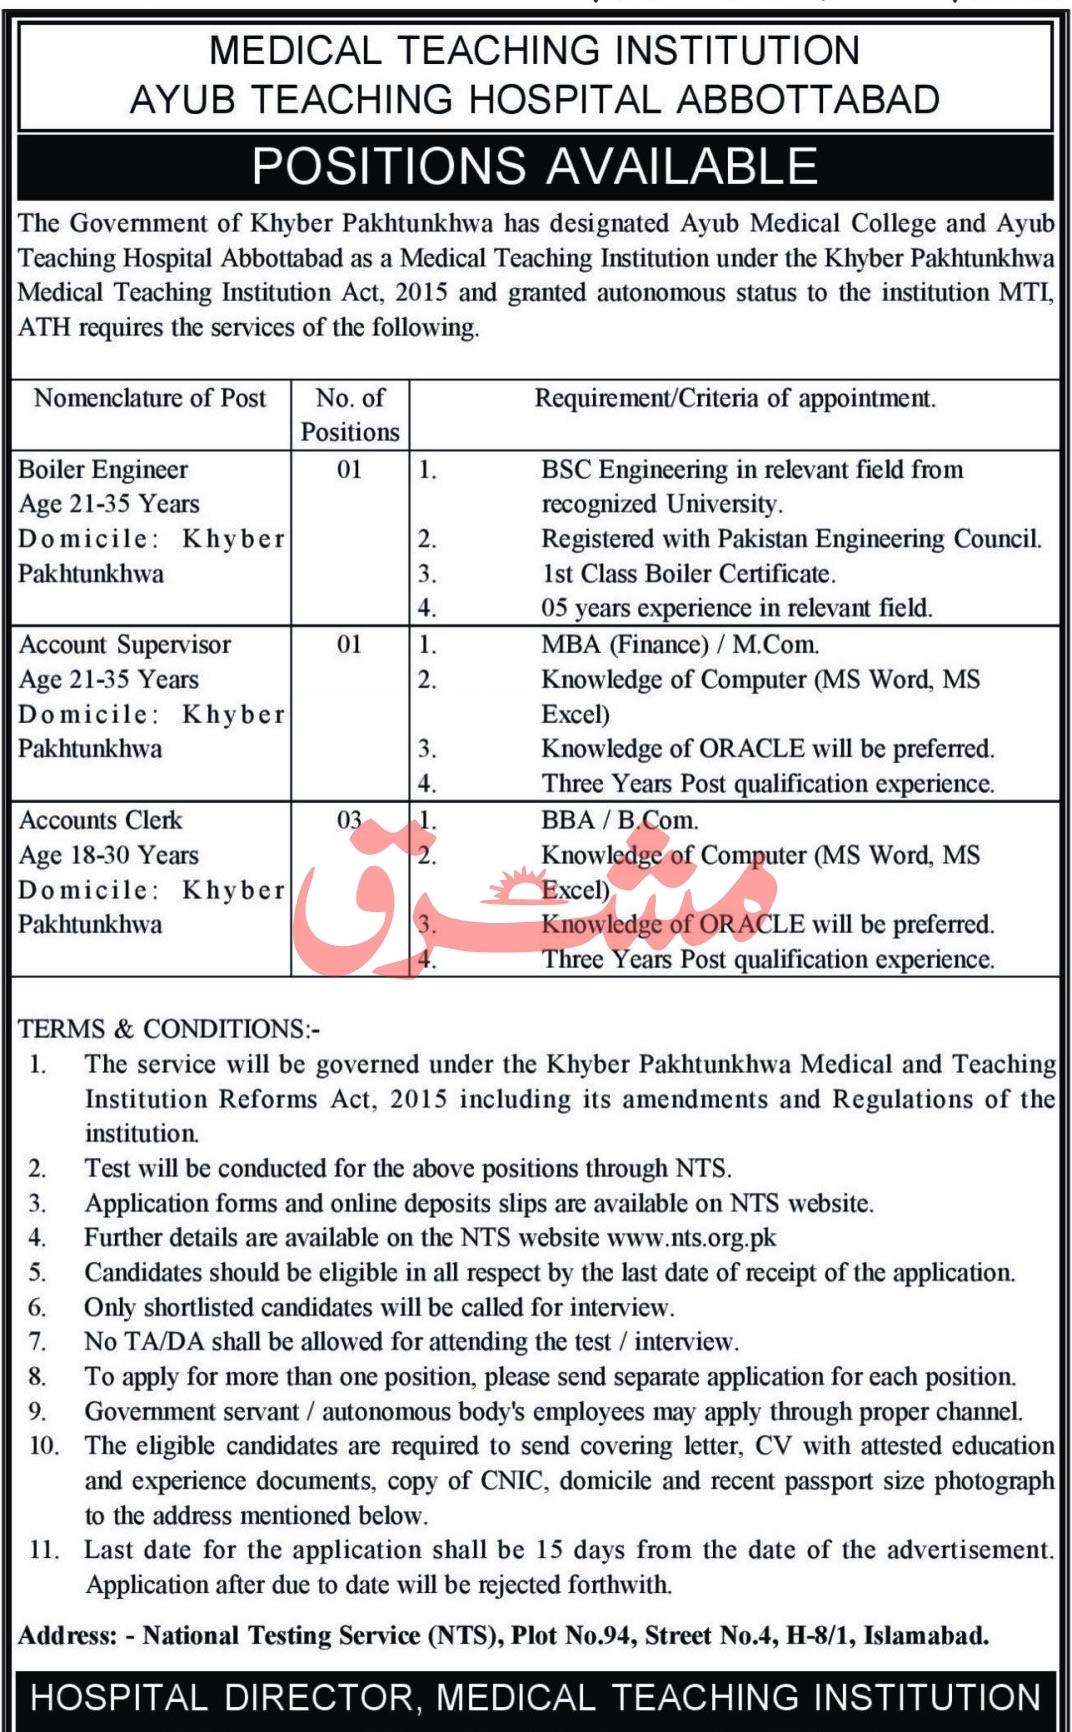 Ayub Teaching Hospital Medical Teaching Institution Abbottabad Jobs NTS Roll No Slip